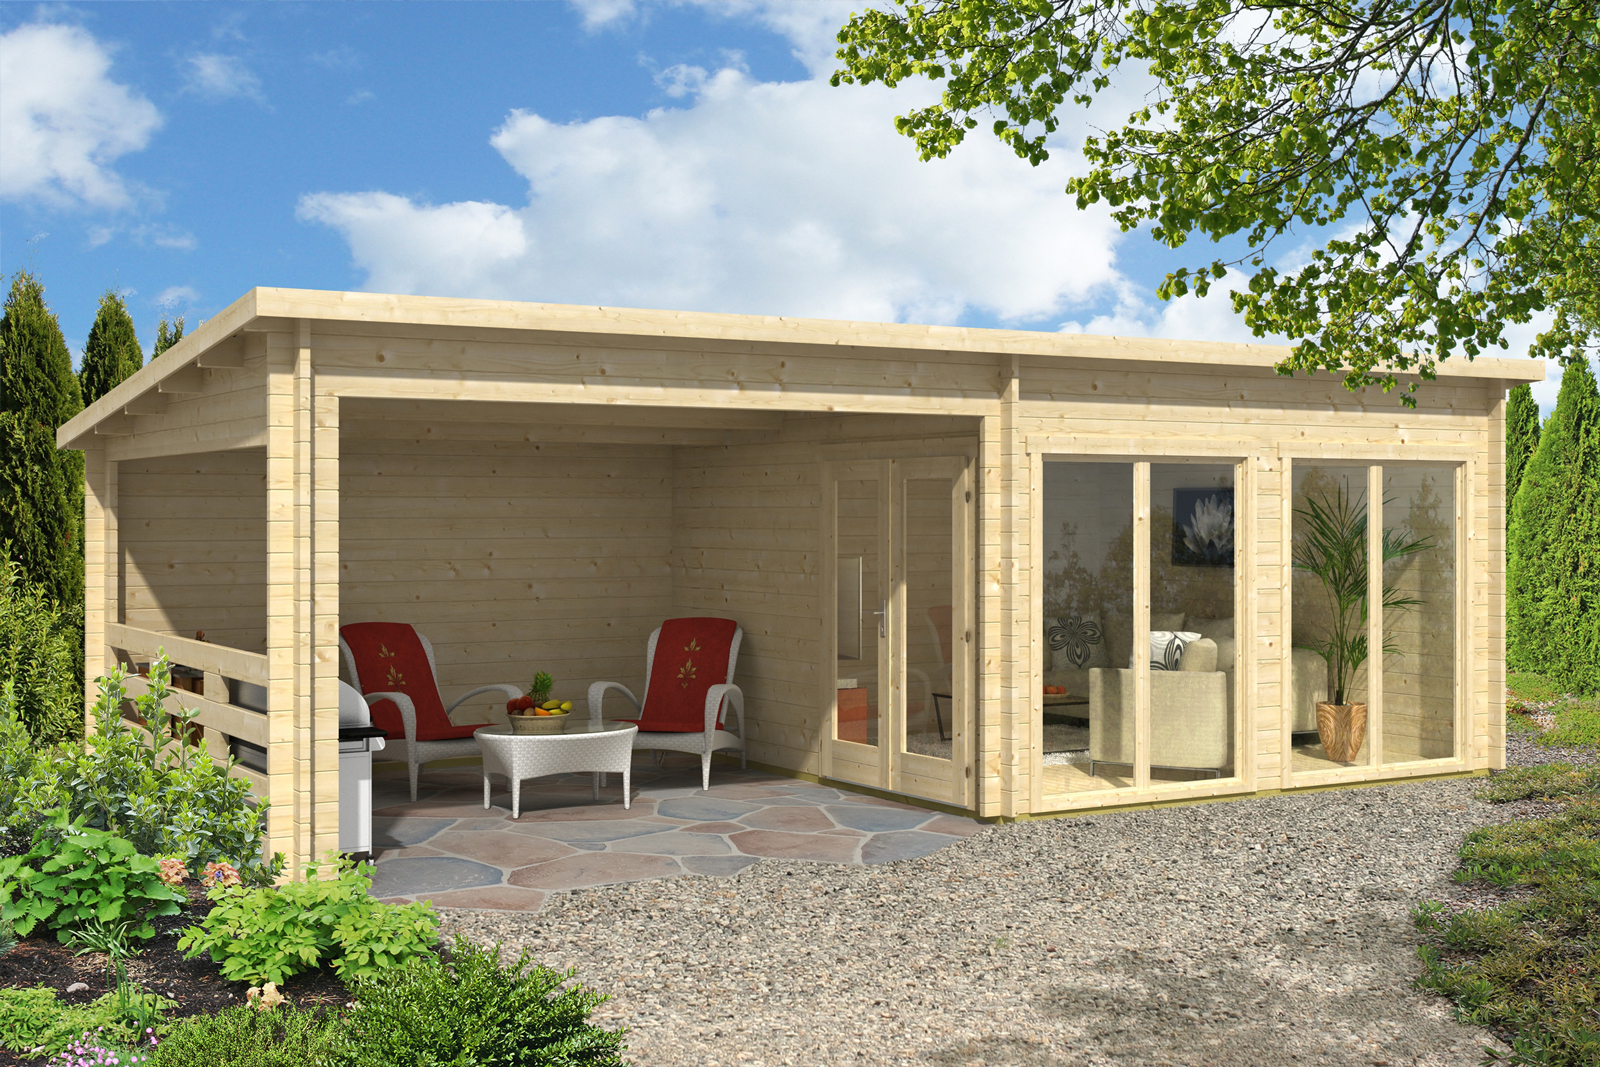 carlsson gartenhaus island iso. Black Bedroom Furniture Sets. Home Design Ideas